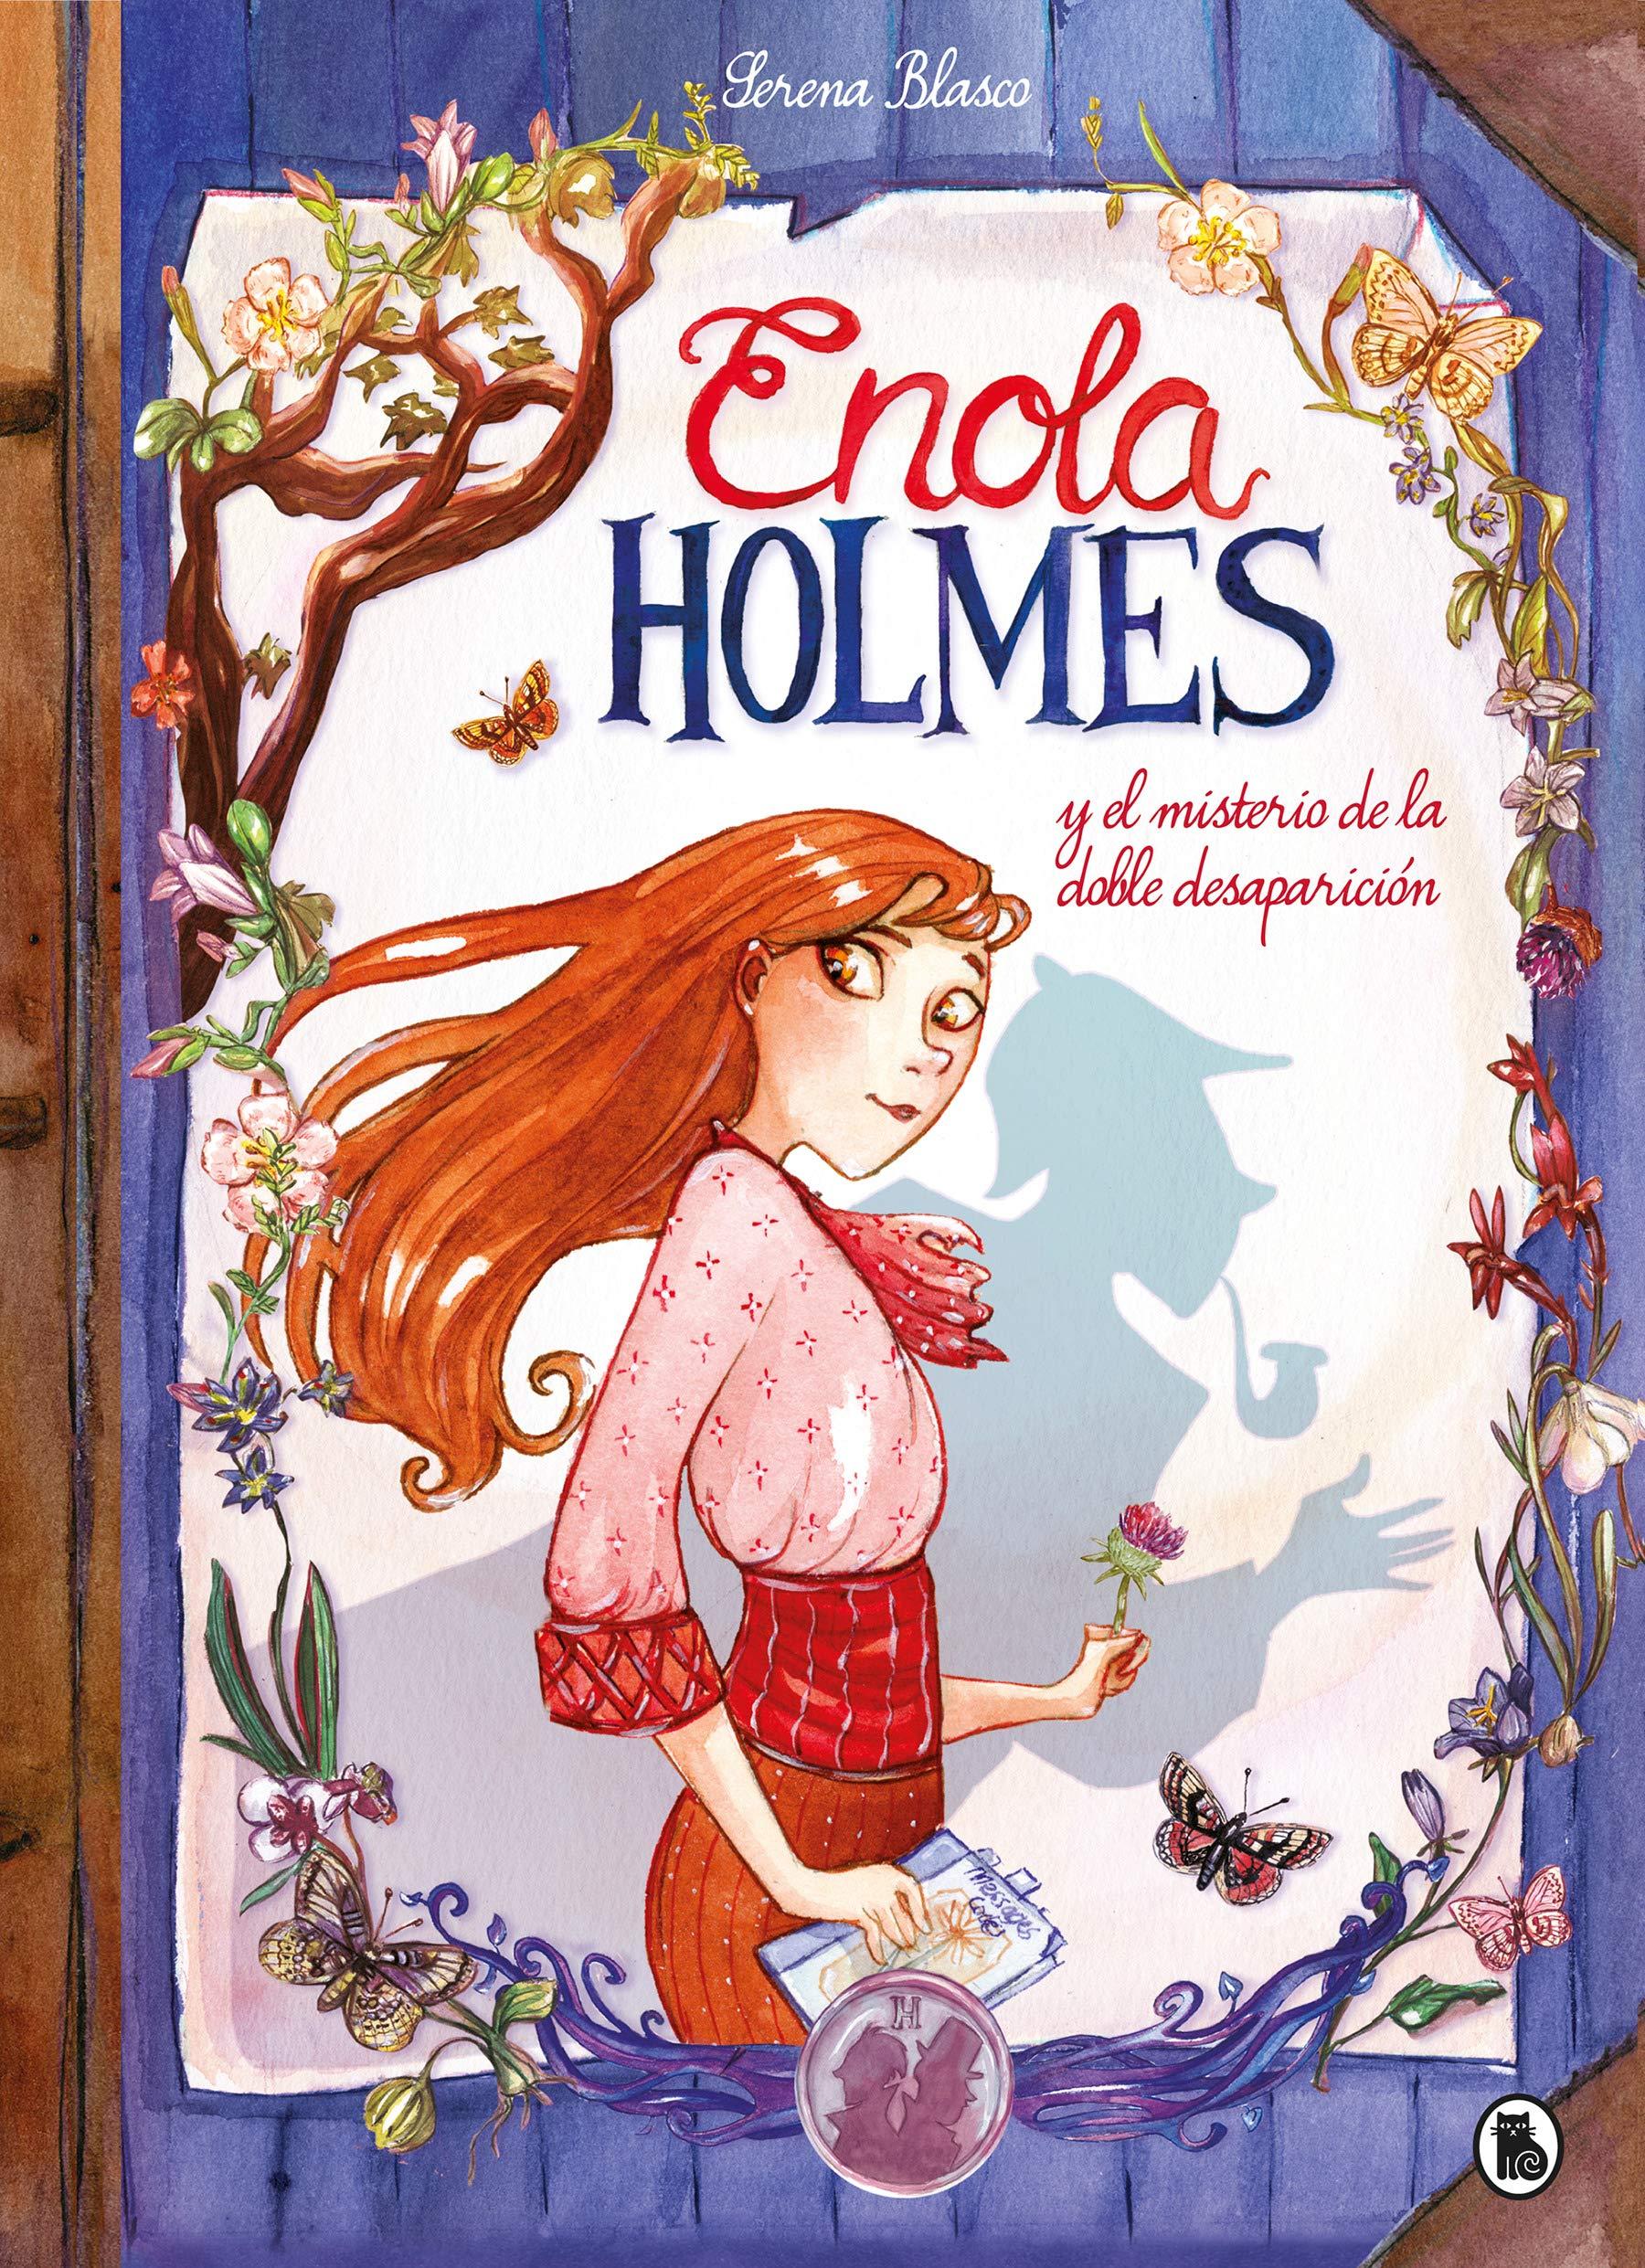 Novela gráfica de Enola Holmes